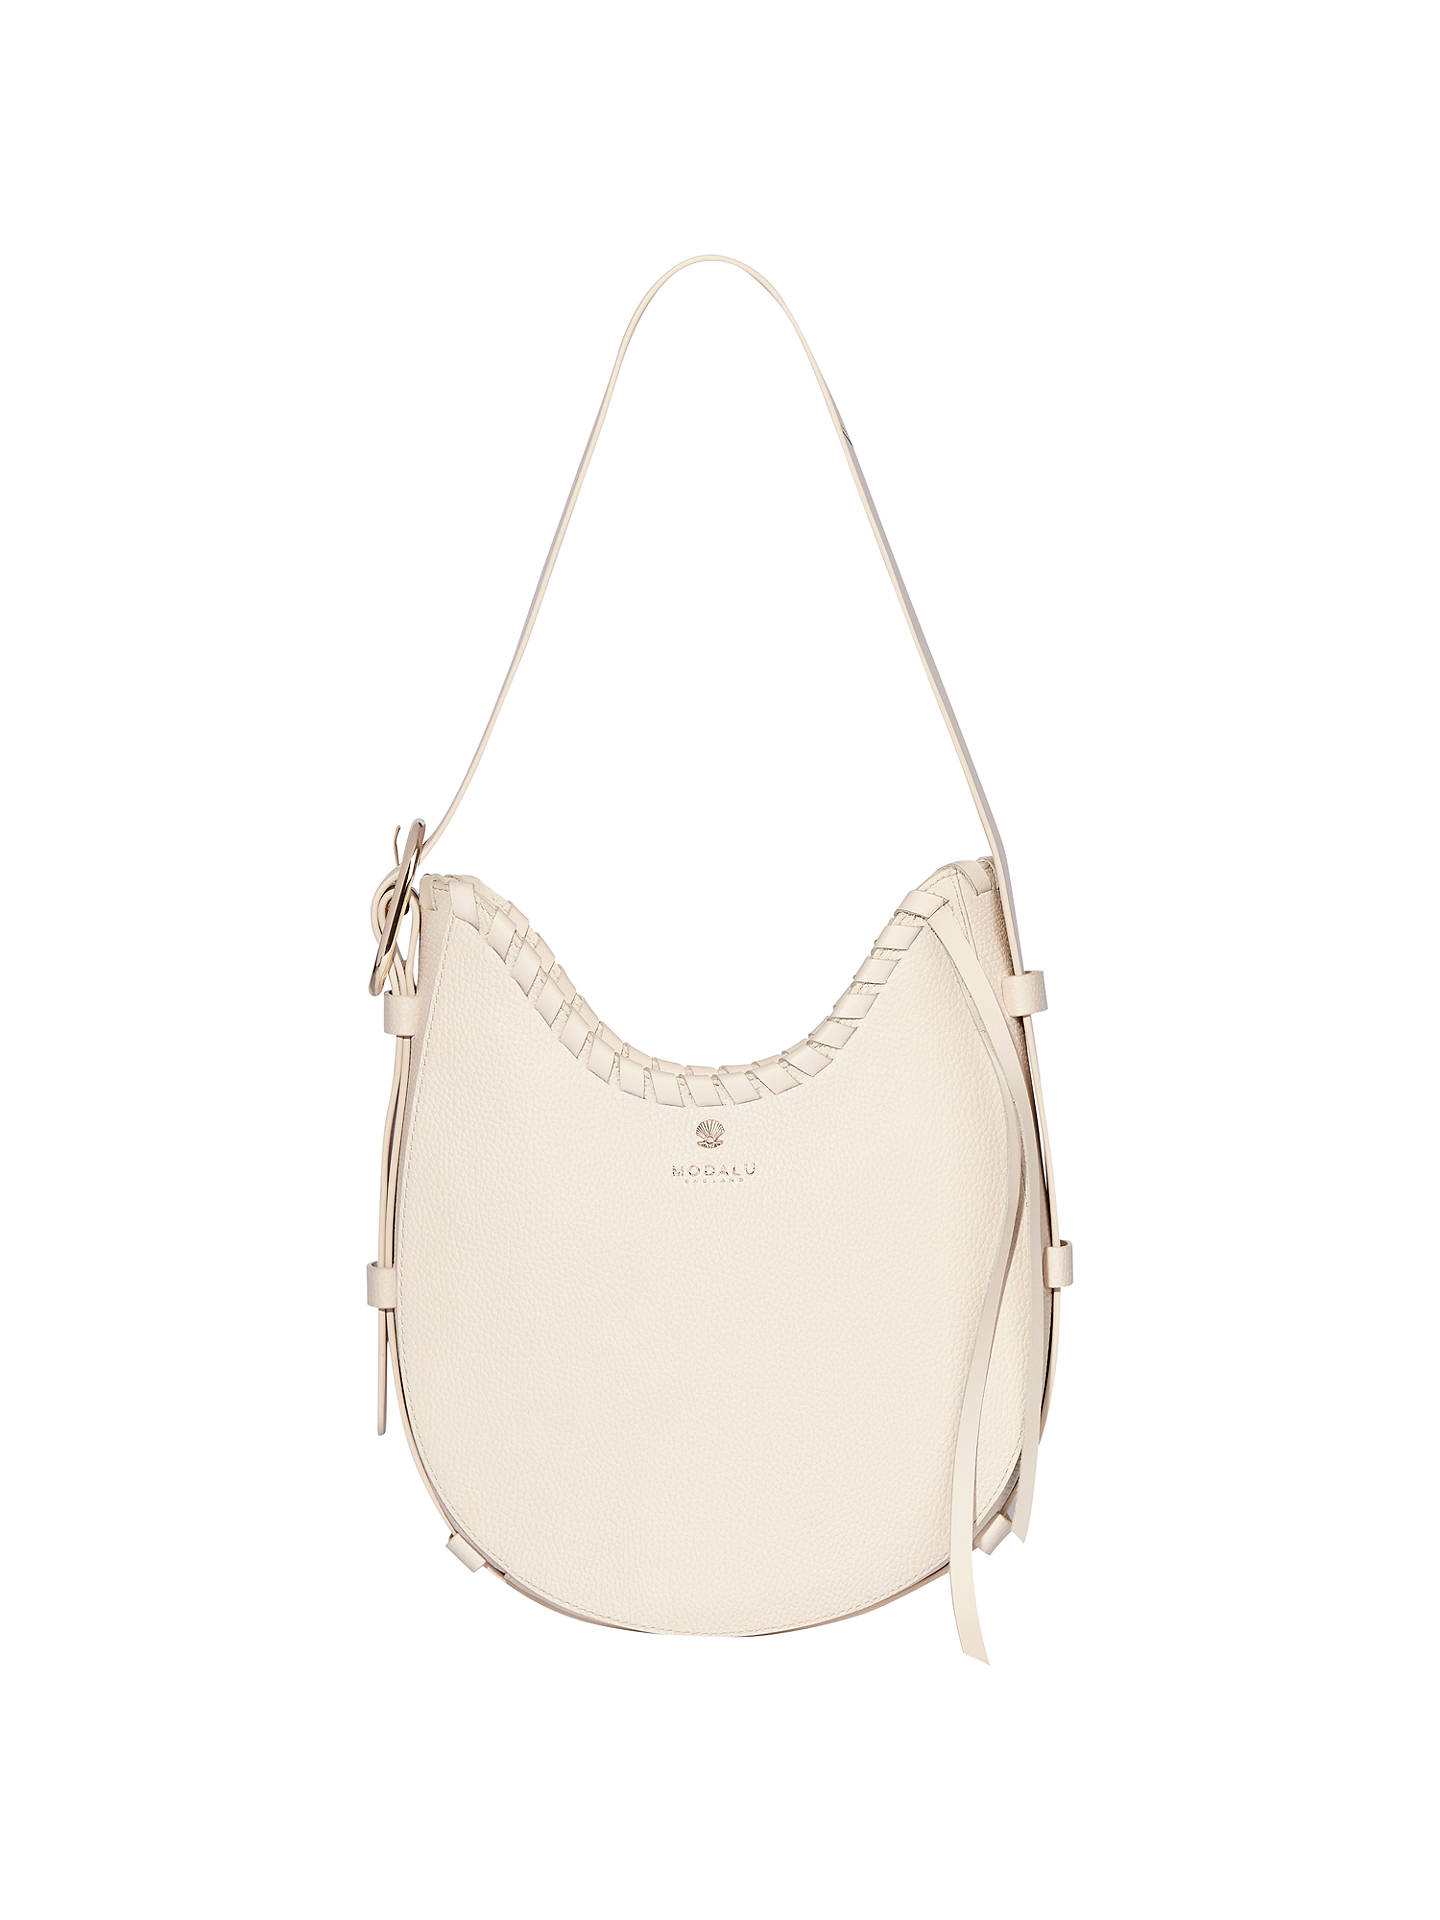 ad6731d33e Buy Modalu Luna Scoop Leather Small Shoulder Bag